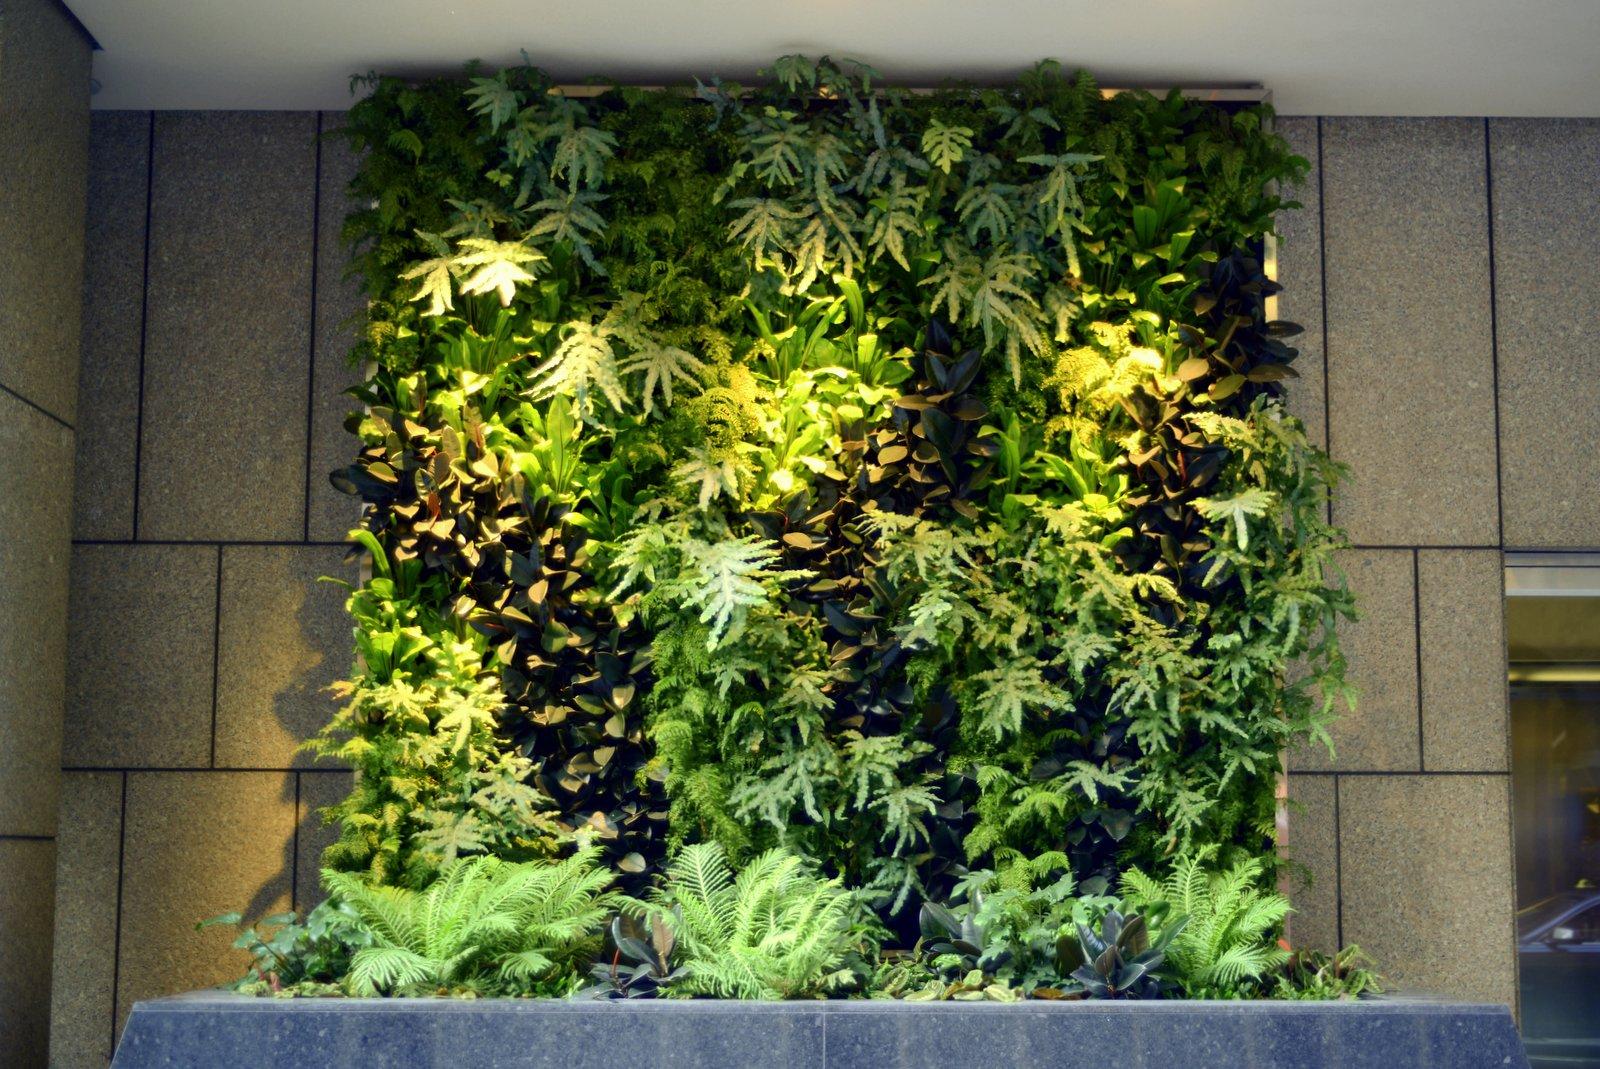 Plants On Walls Vertical Garden Systems: 6 Months Mature